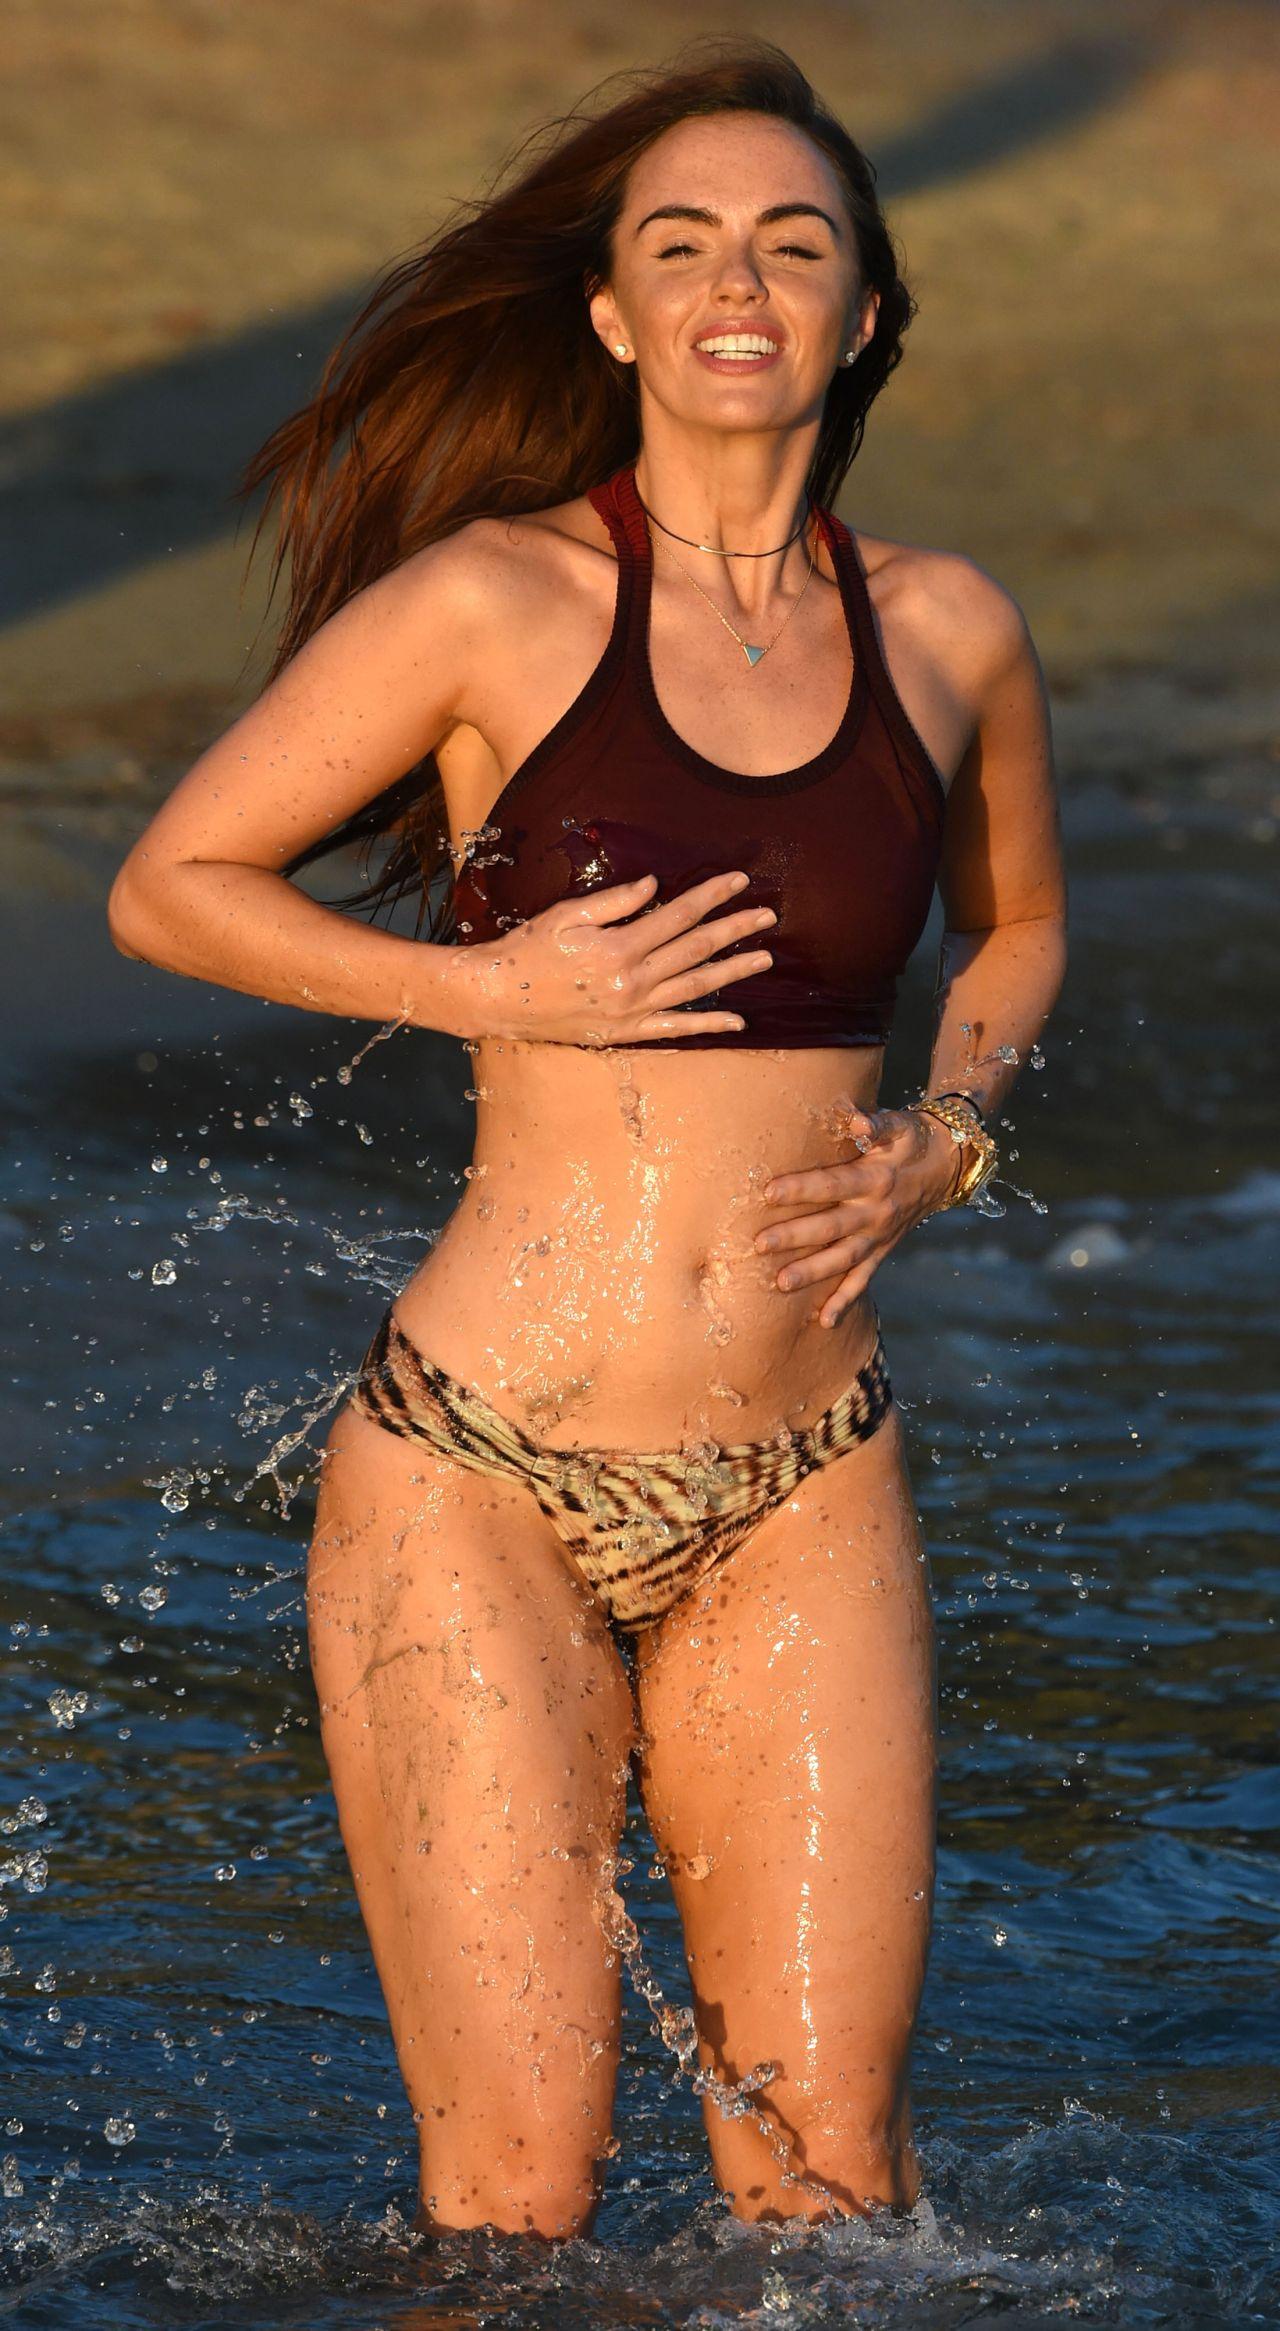 Jennifer nettles bikini pics